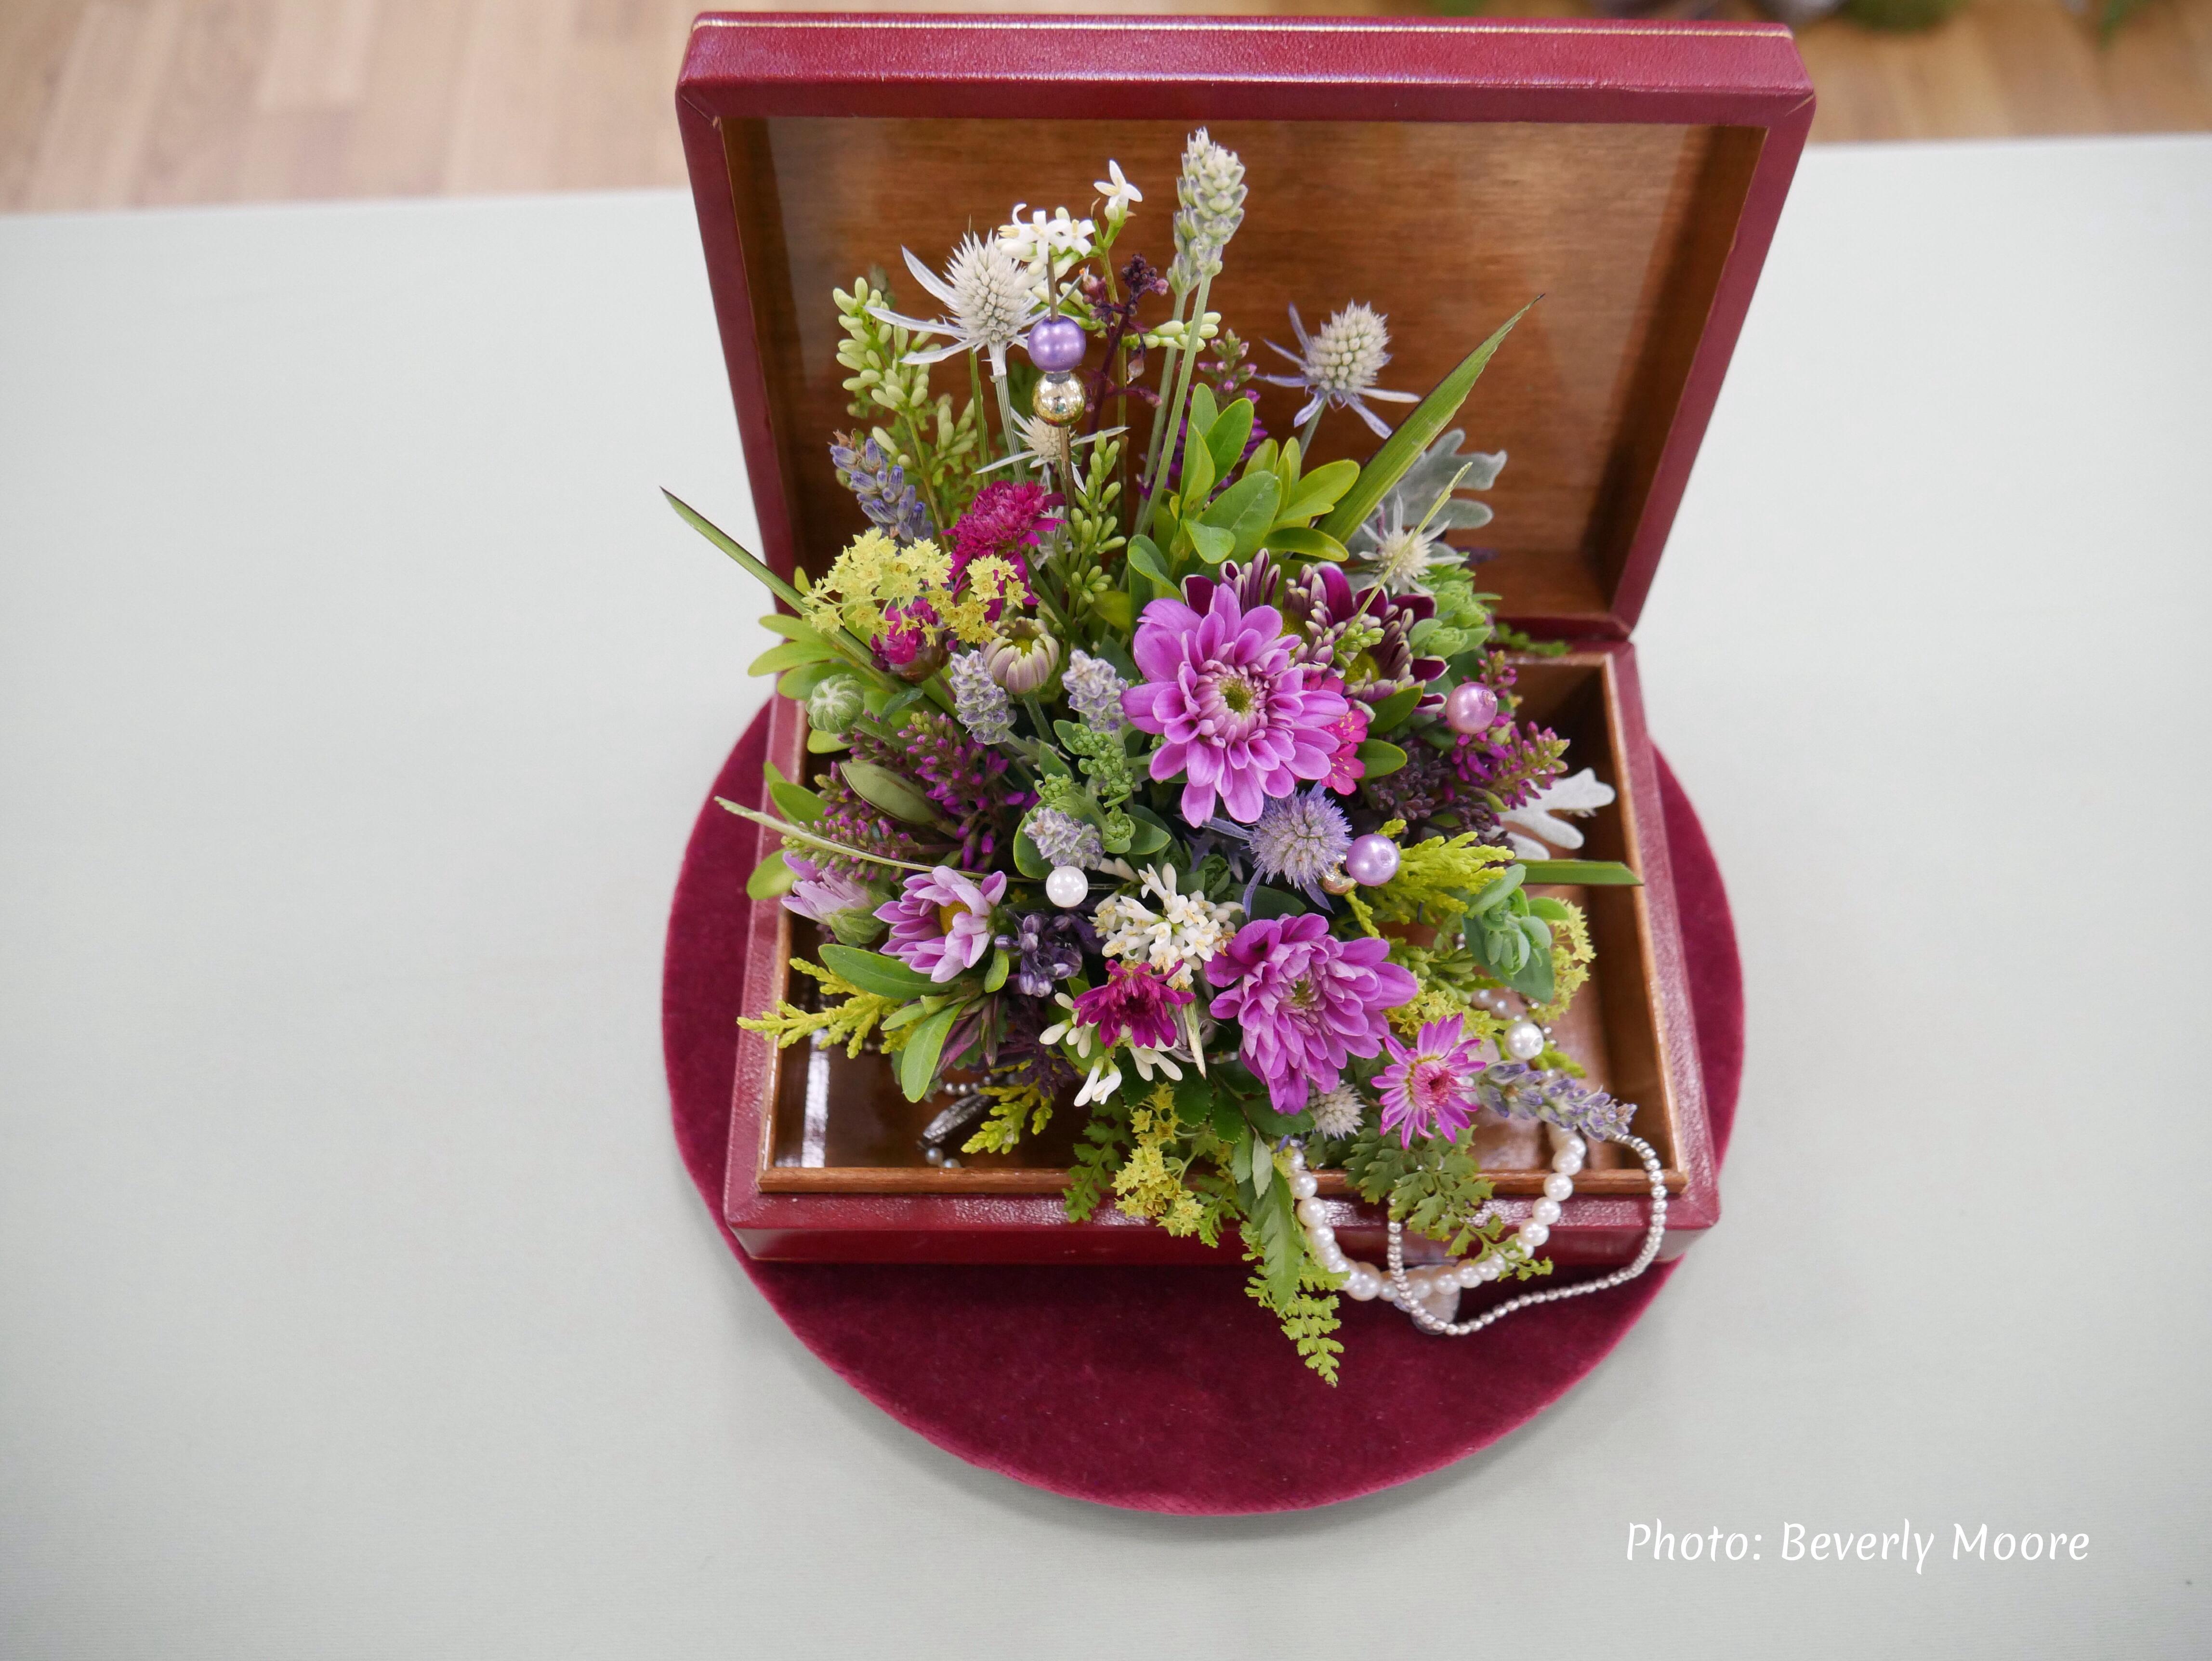 PETITE - THIRD - IRENE MORRIS